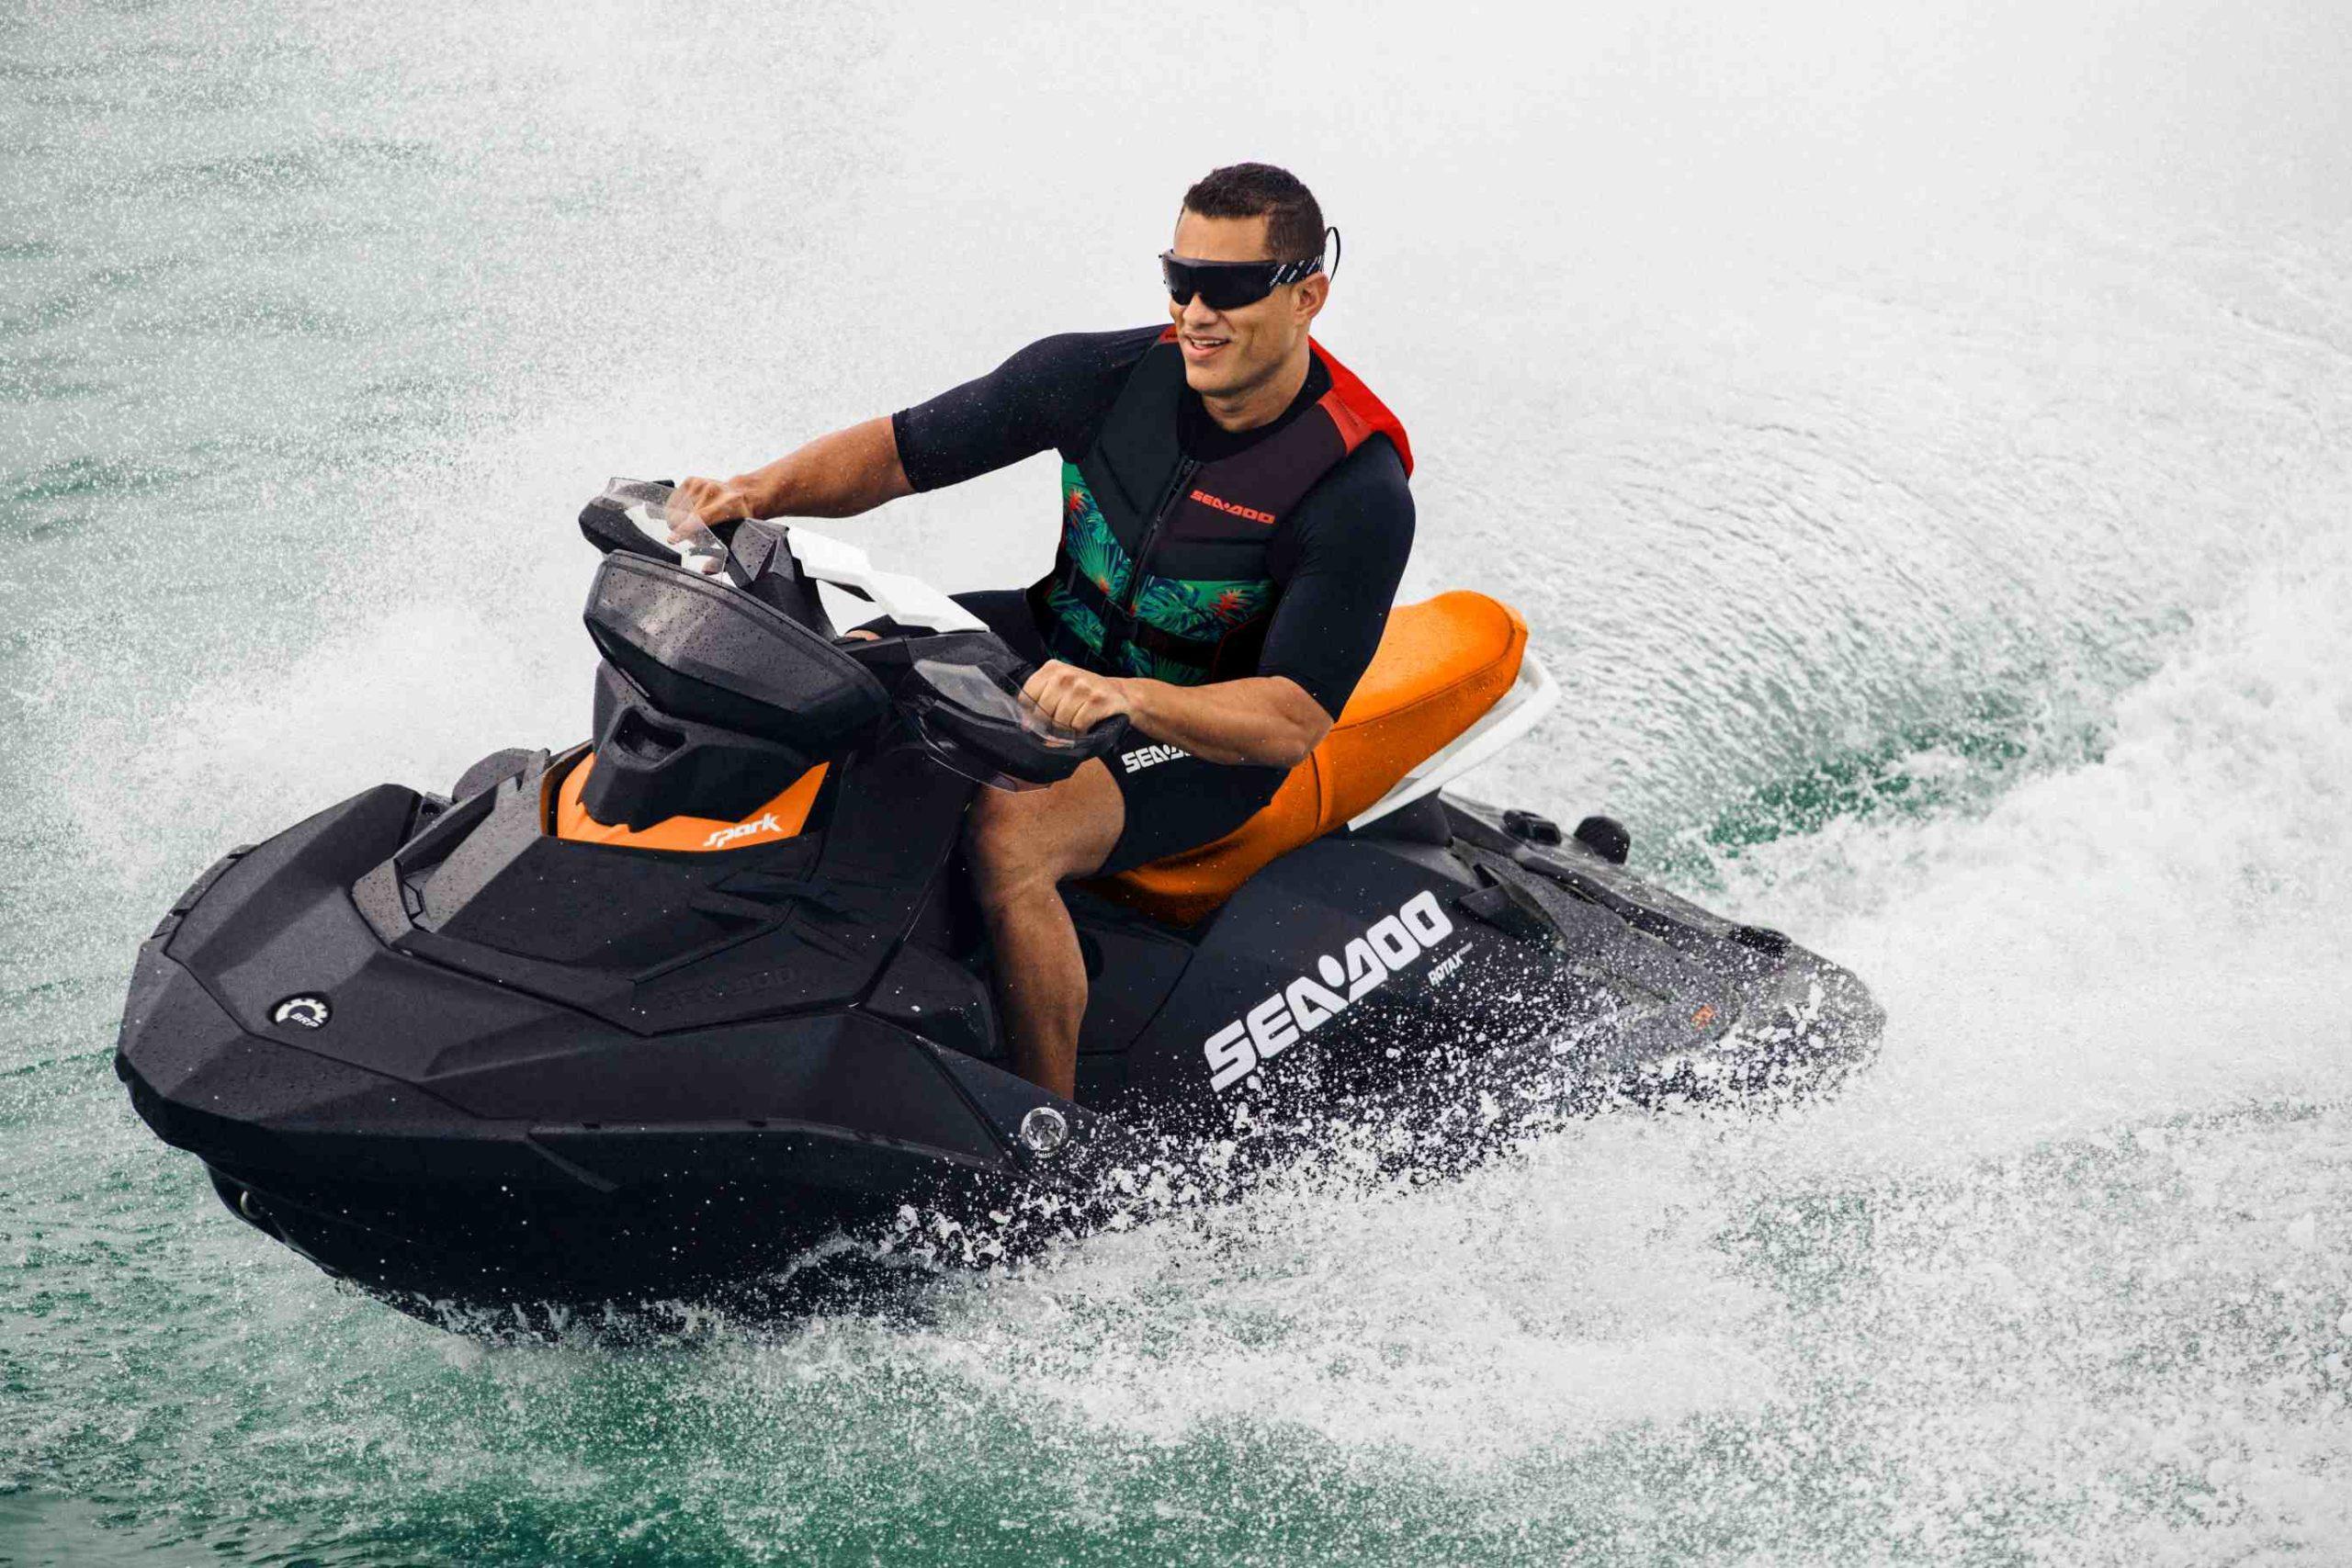 SEA-MY21-SPARK-Men-Riding-Alone-Action-RGB